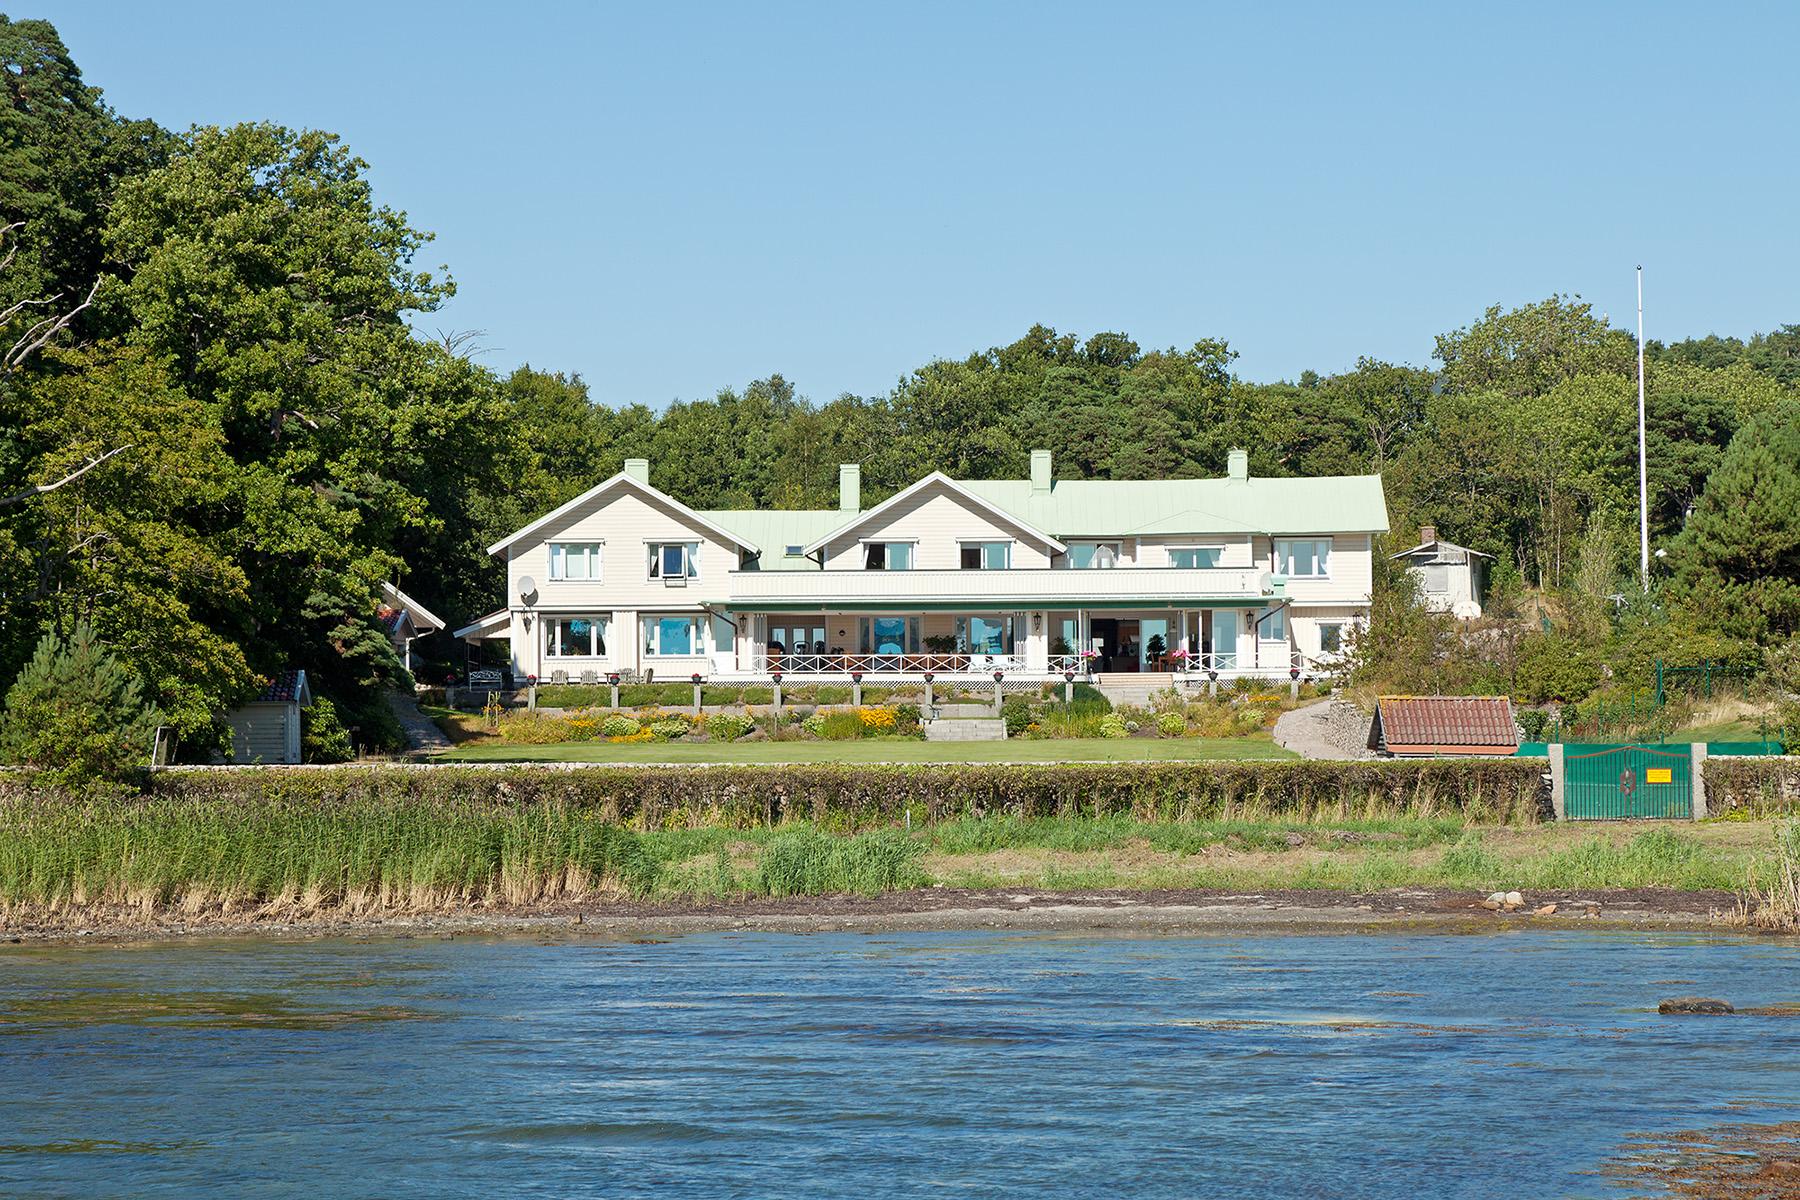 Single Family Home for Sale at Spacious living on one of Gothenburgs finest adresses Gustaf V:s Väg 11 Other Vastra Gotaland, Vastra Gotaland, 42943 Sweden